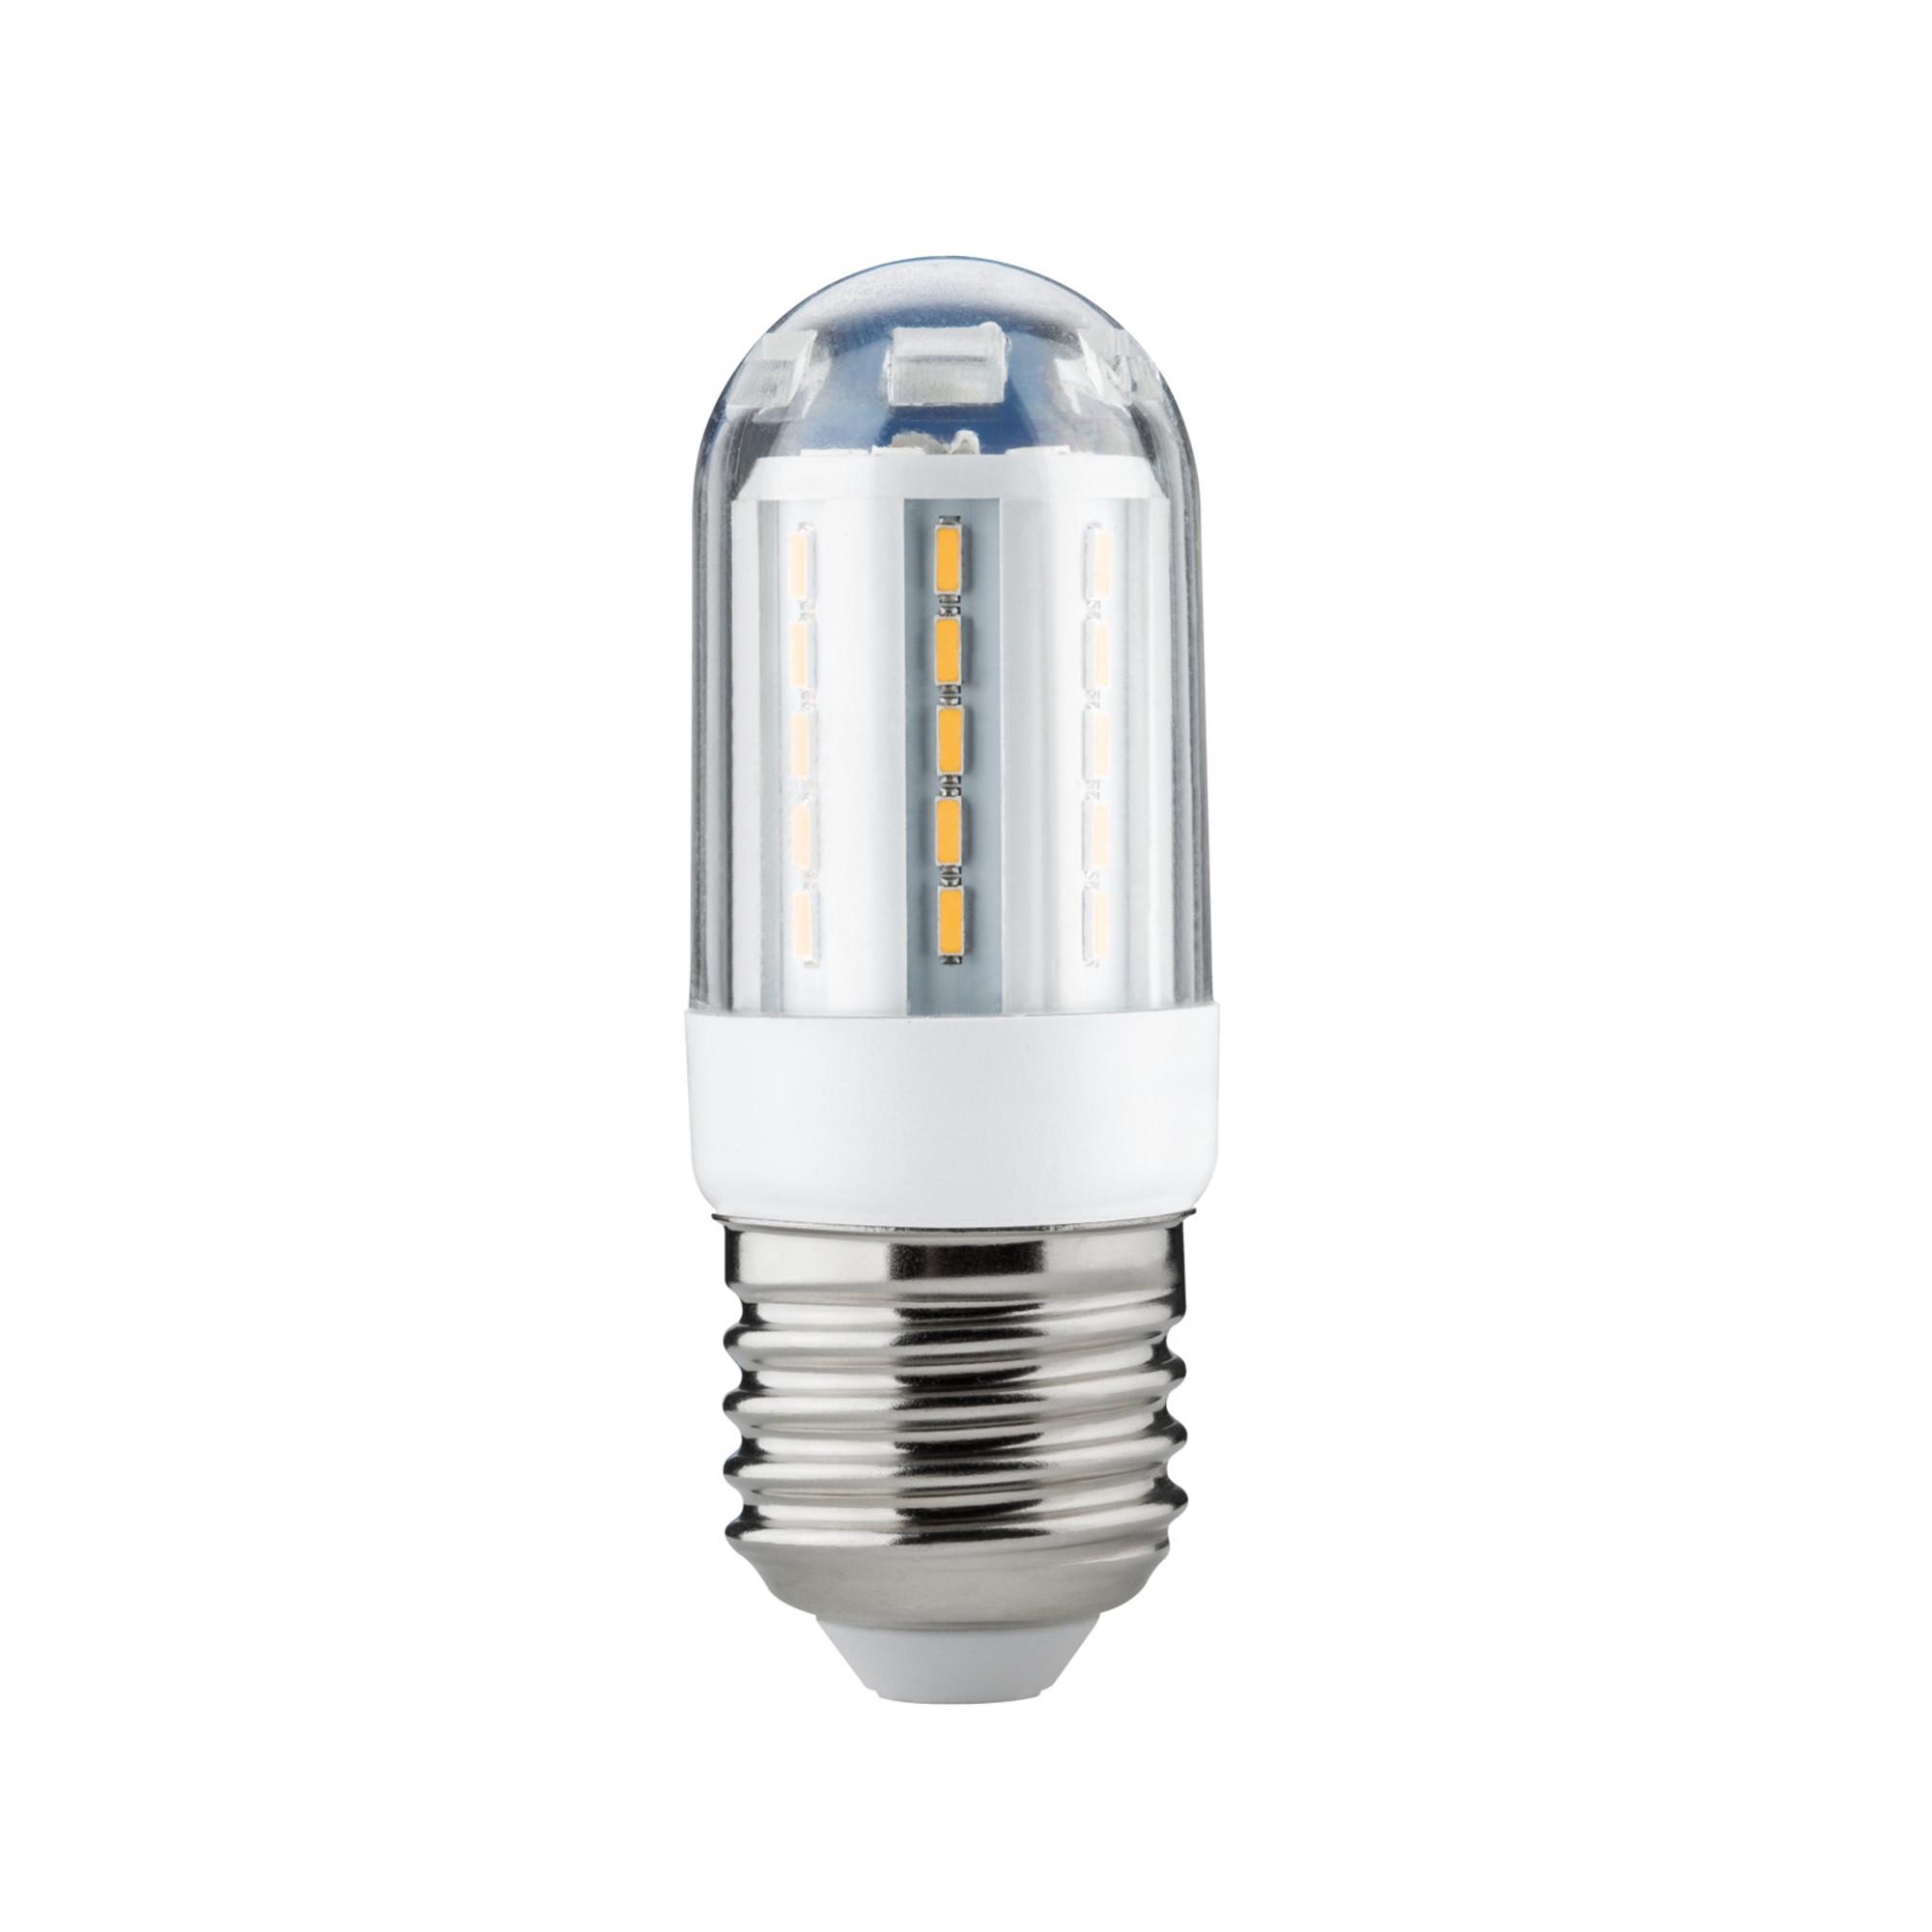 Лампа светодиодная Paulmann Кукуруза 3.5Вт 340лм 2700K E27 230В Прозрачный 28411.